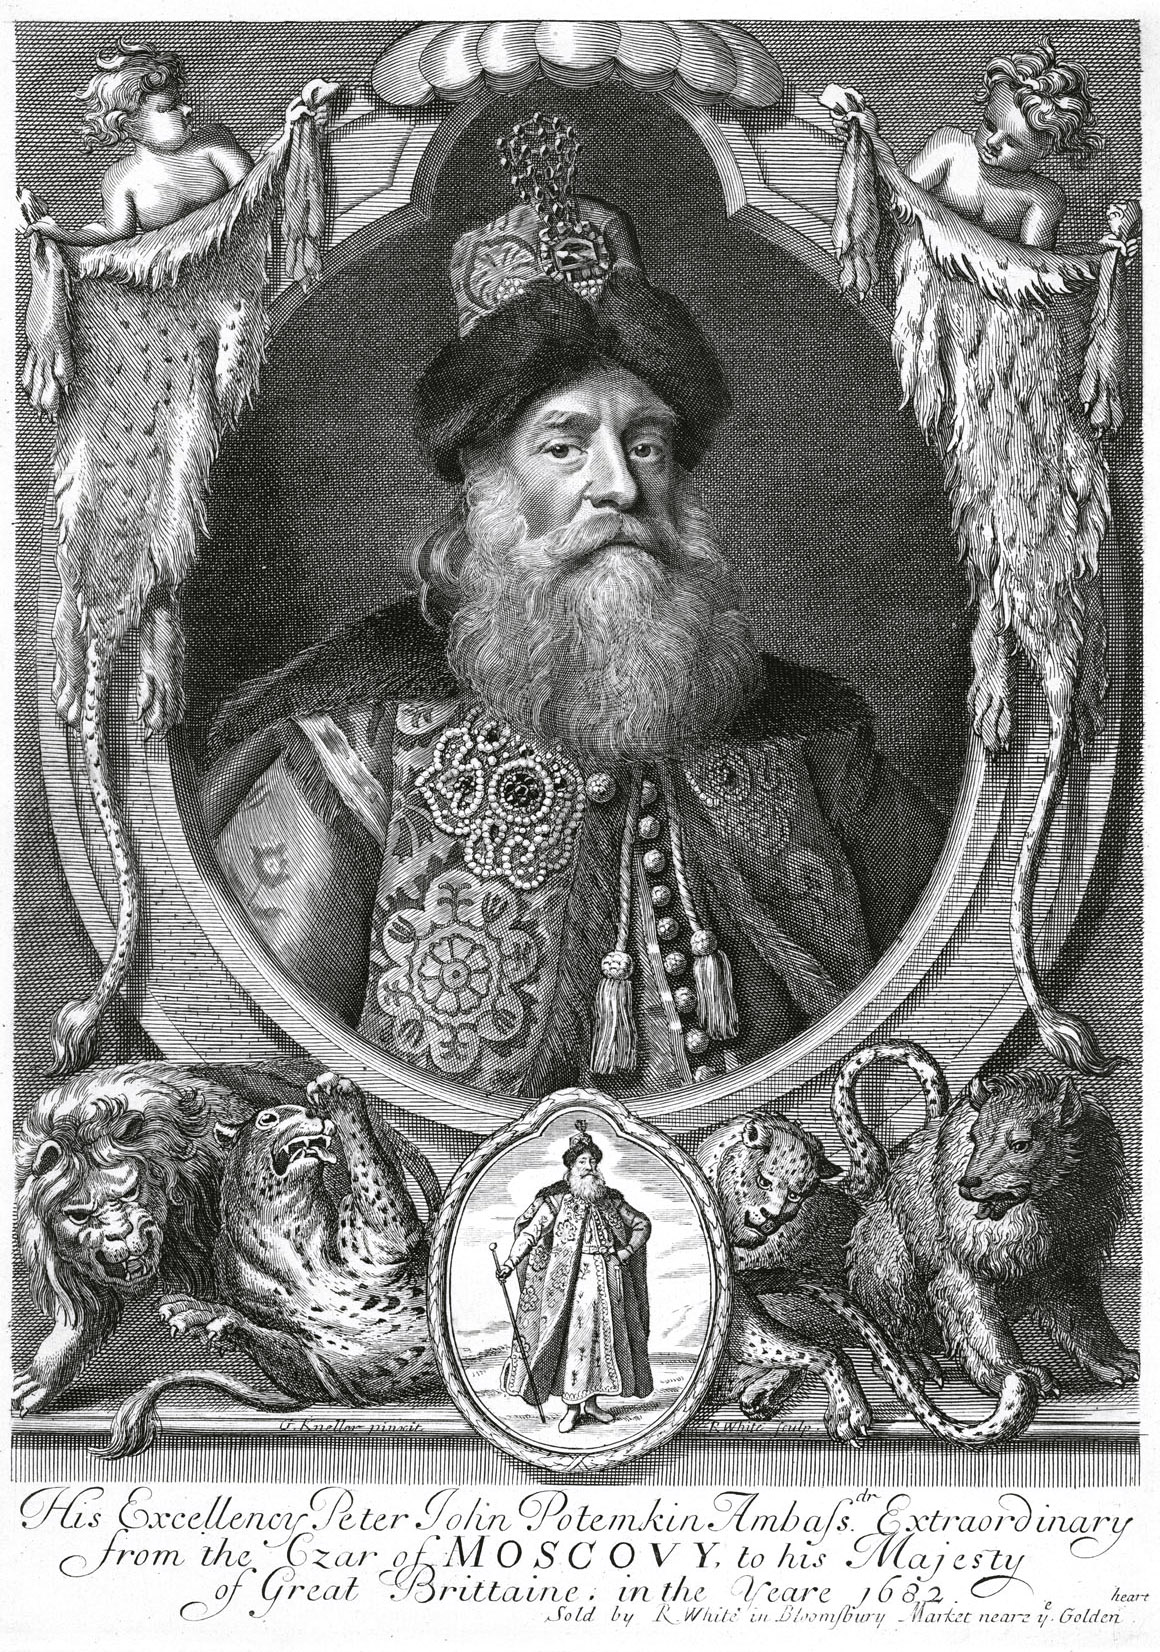 321. Князь Петр Иванович Потемкин, гравюра Вайта.